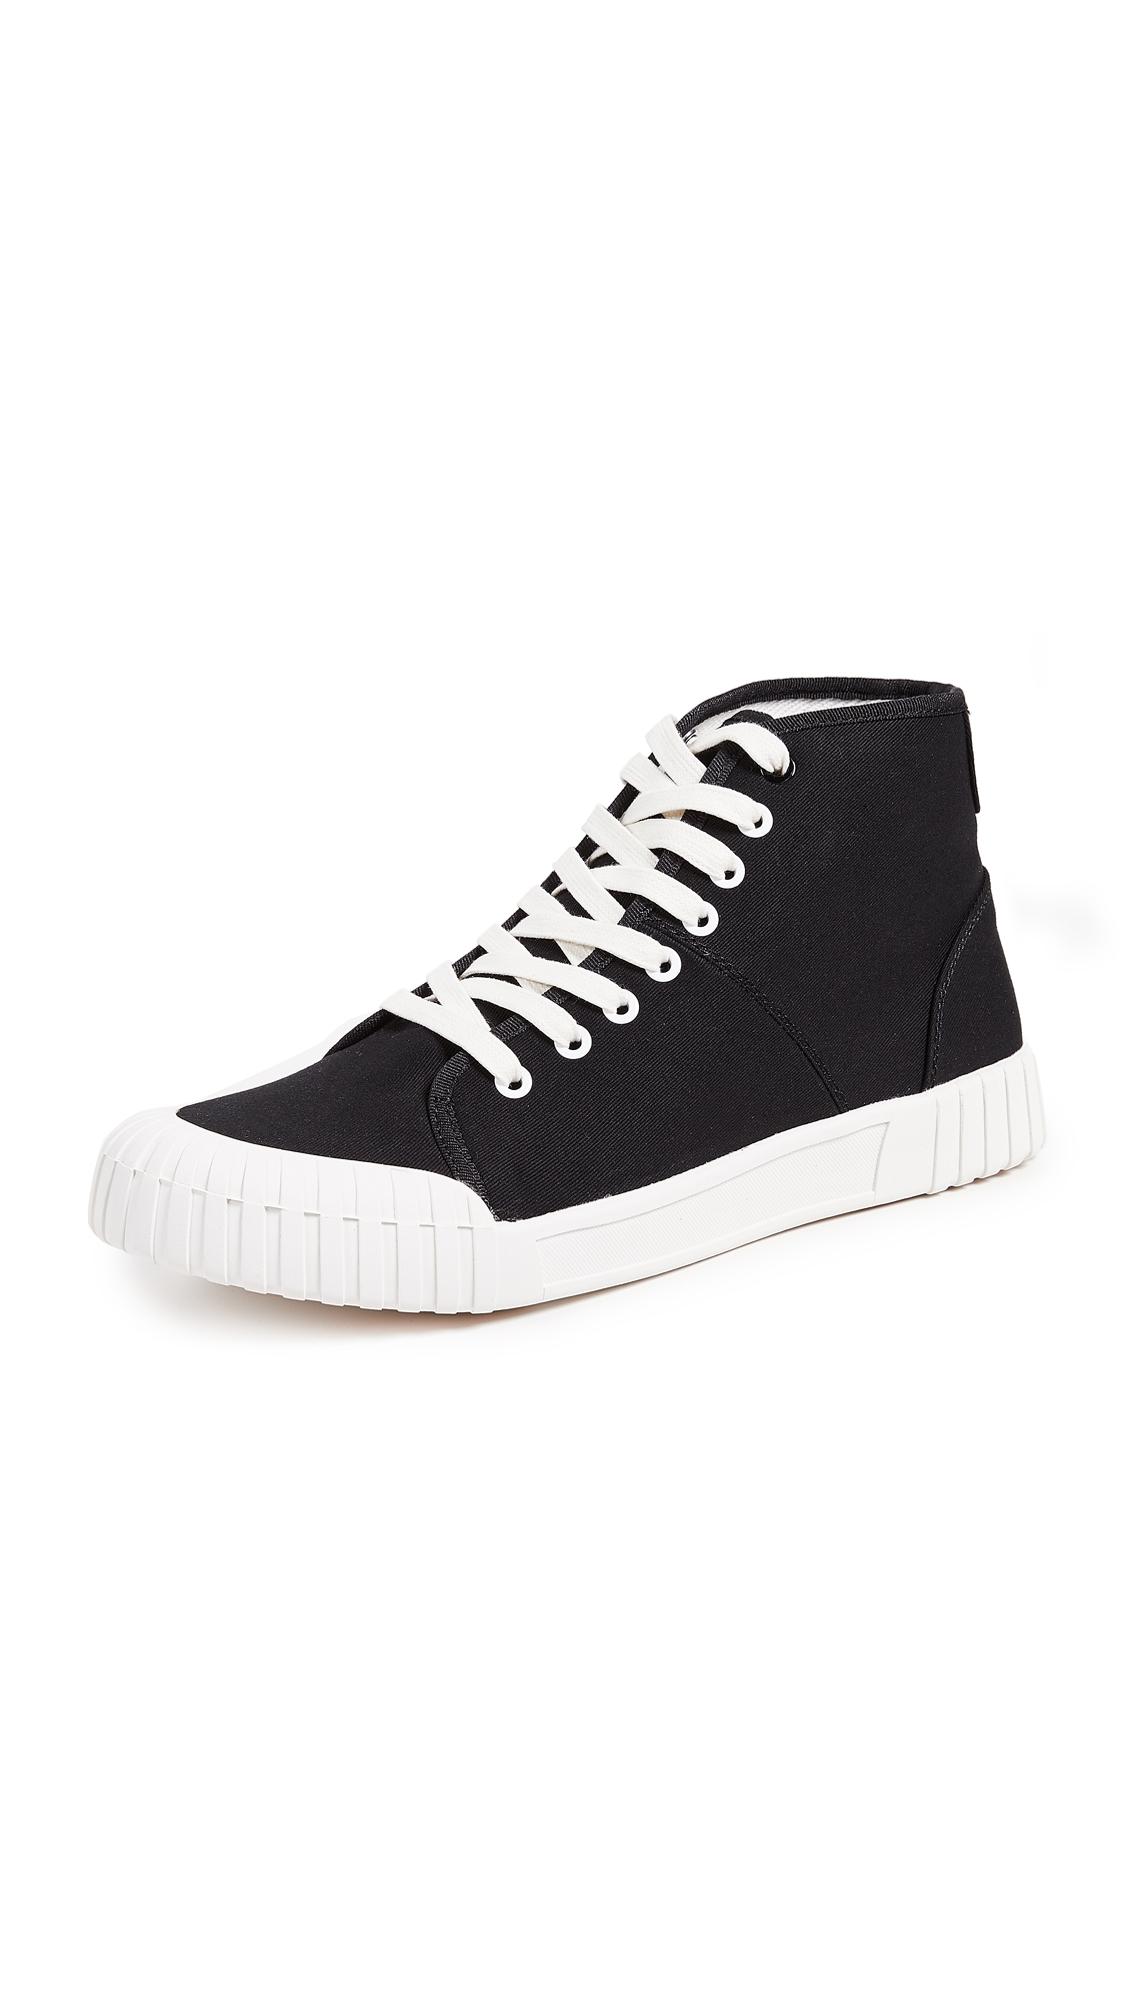 GOOD NEWS Bagger High Top Sneakers in Black